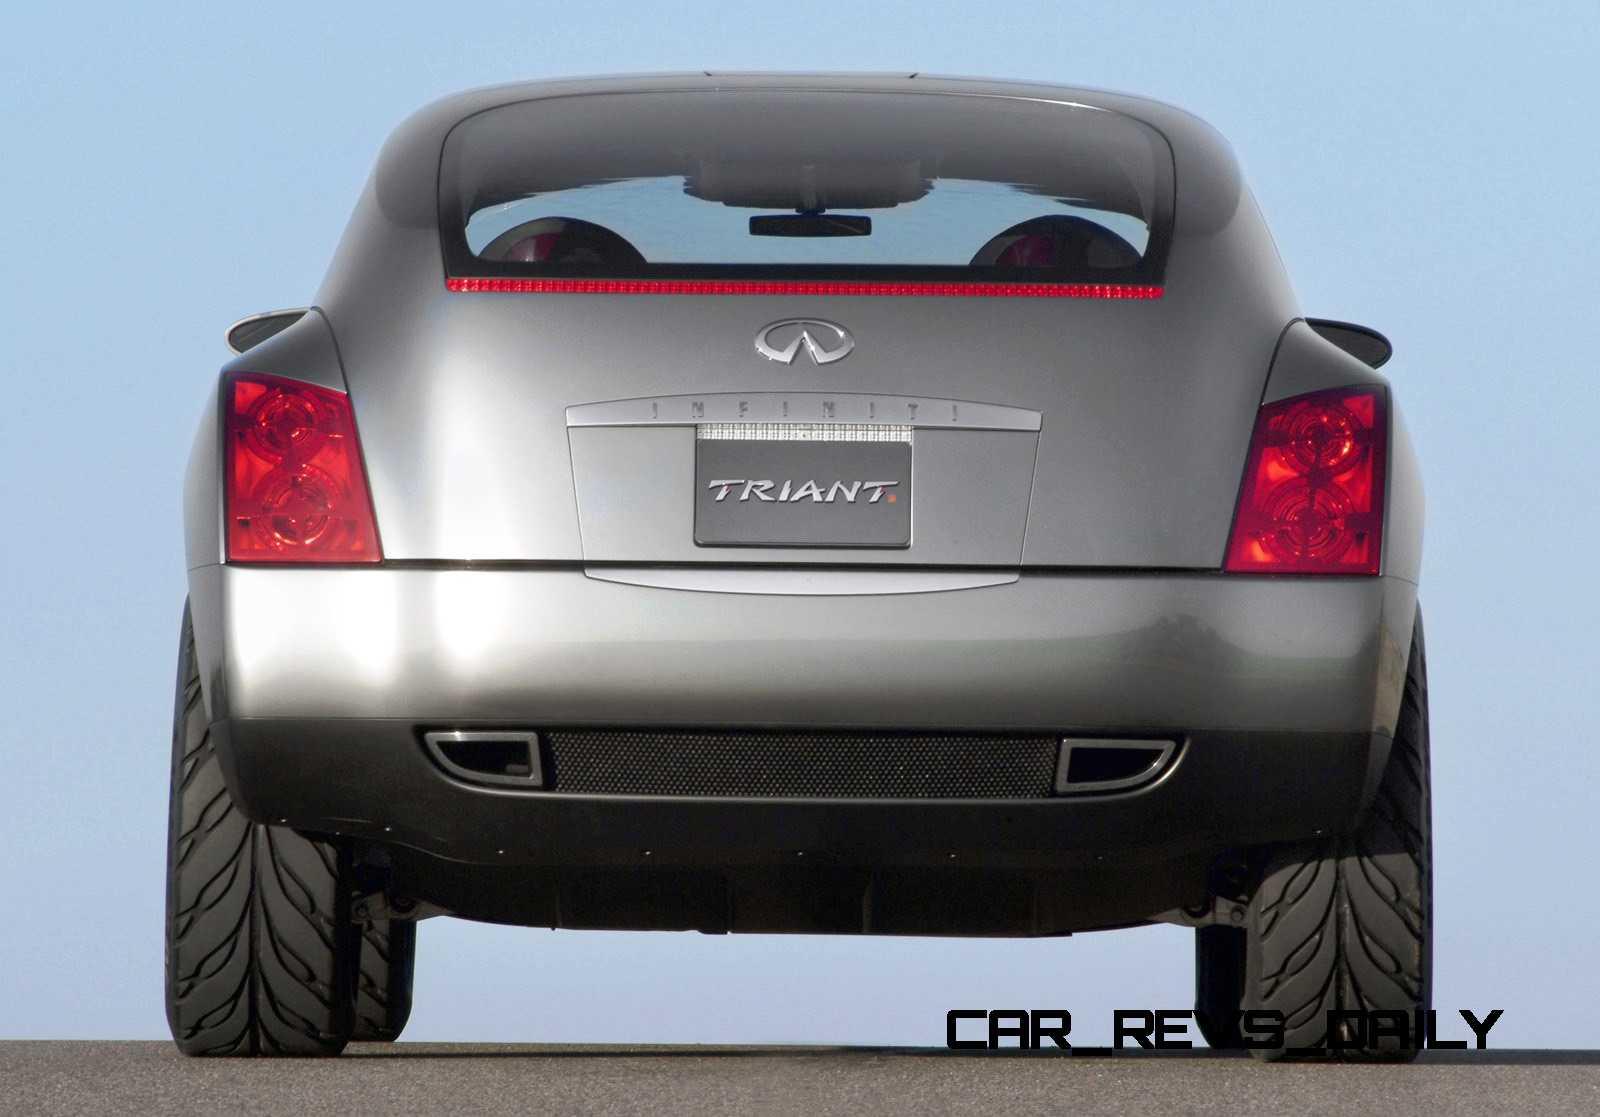 Design evolution series 2003 infiniti triant concept concept flashback 2003 infiniti triant 12 vanachro Images